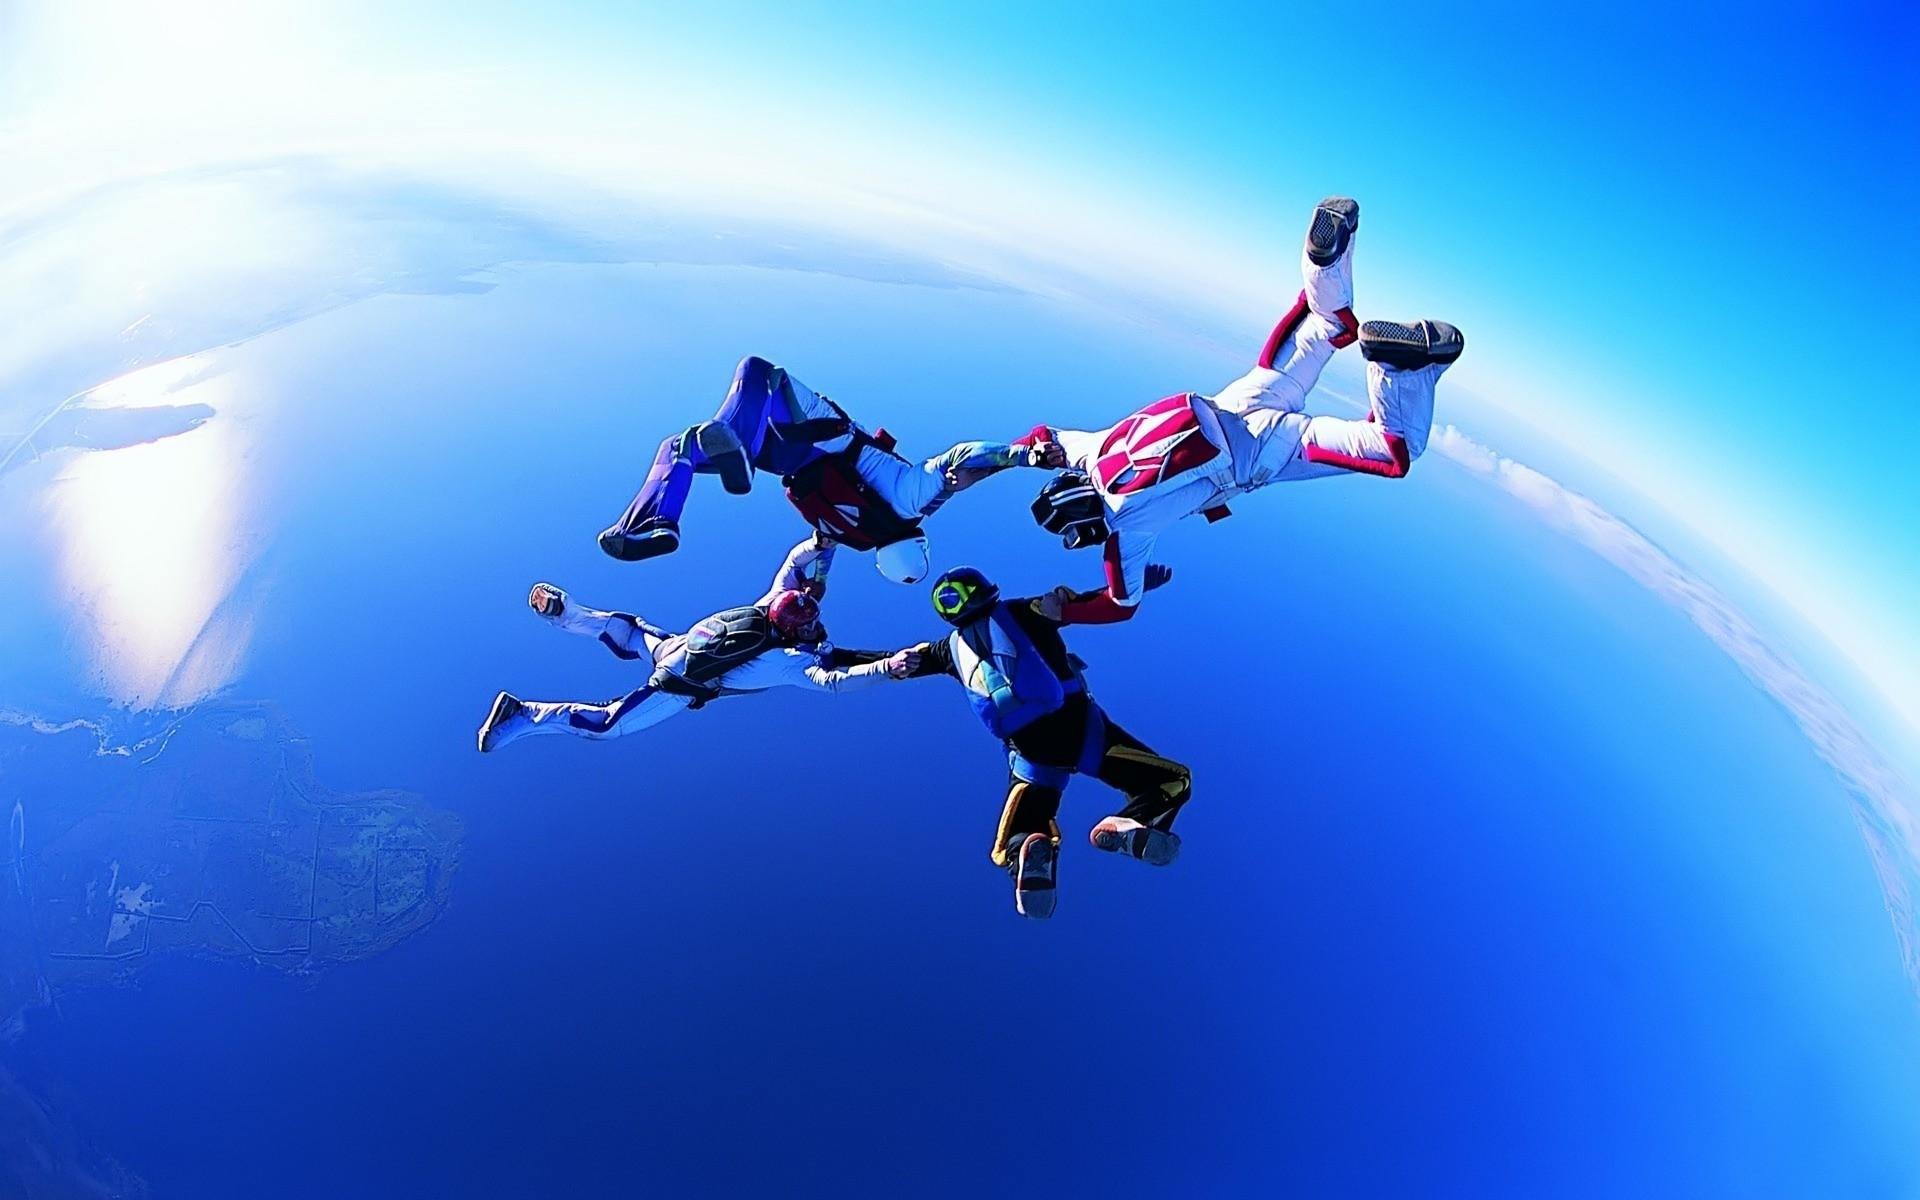 Skydive HD – wallpaper HD